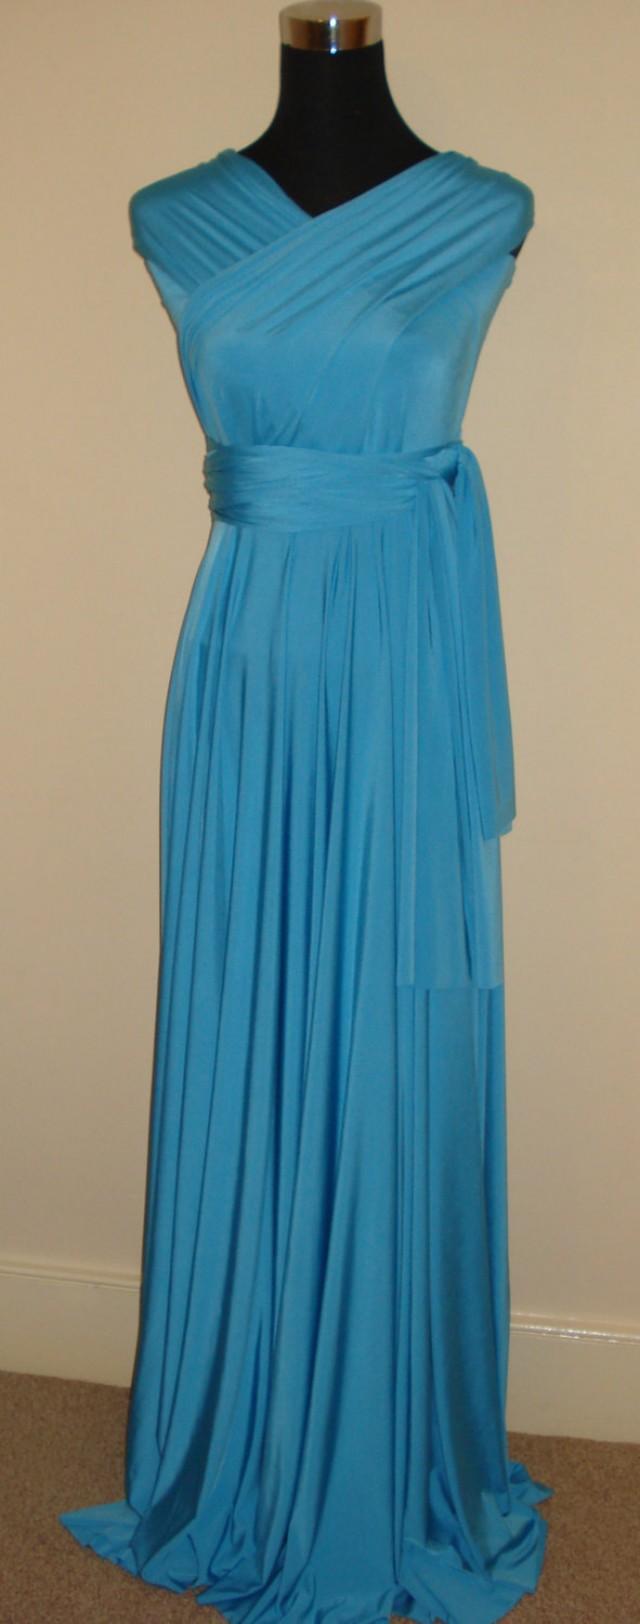 Turquoise Bridesmaid Dress Wedding Dress Infinity Dress Convertible ...